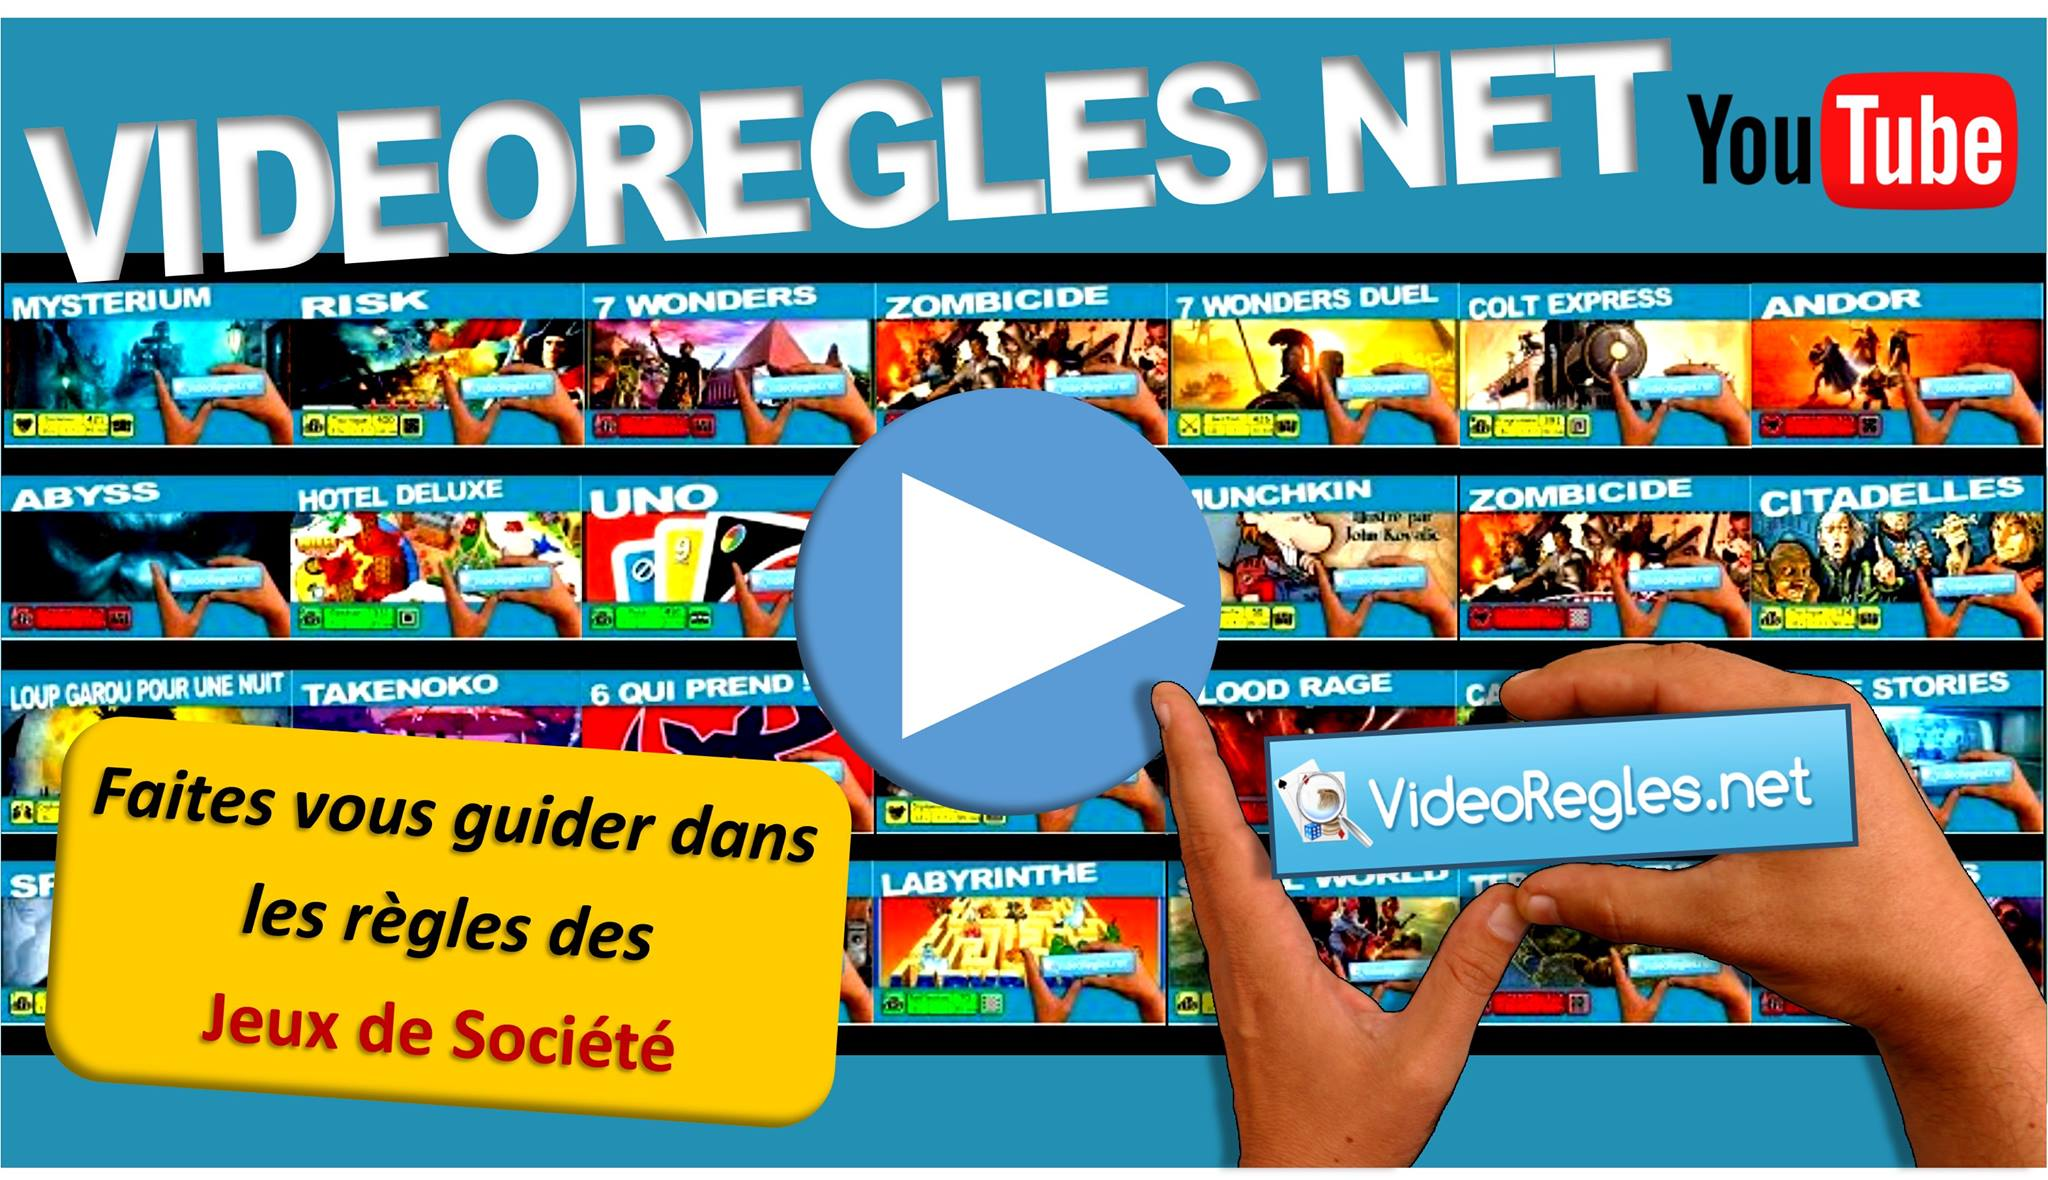 La Cha\u00eene YouTube des Vid\u00e9or\u00e8gles